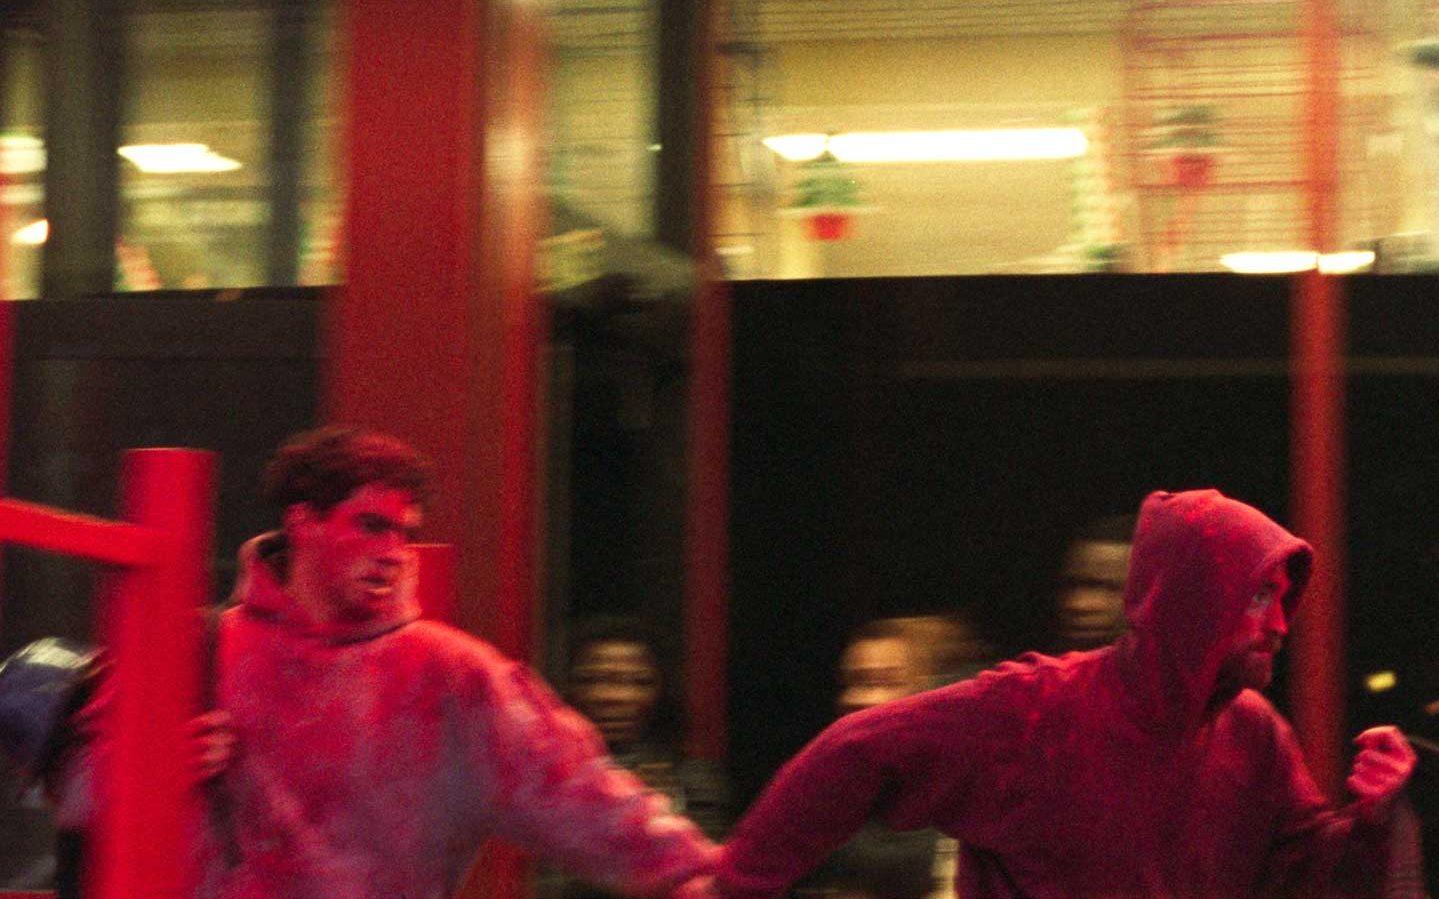 Ben Safdie and Robert Pattinson in Good Time